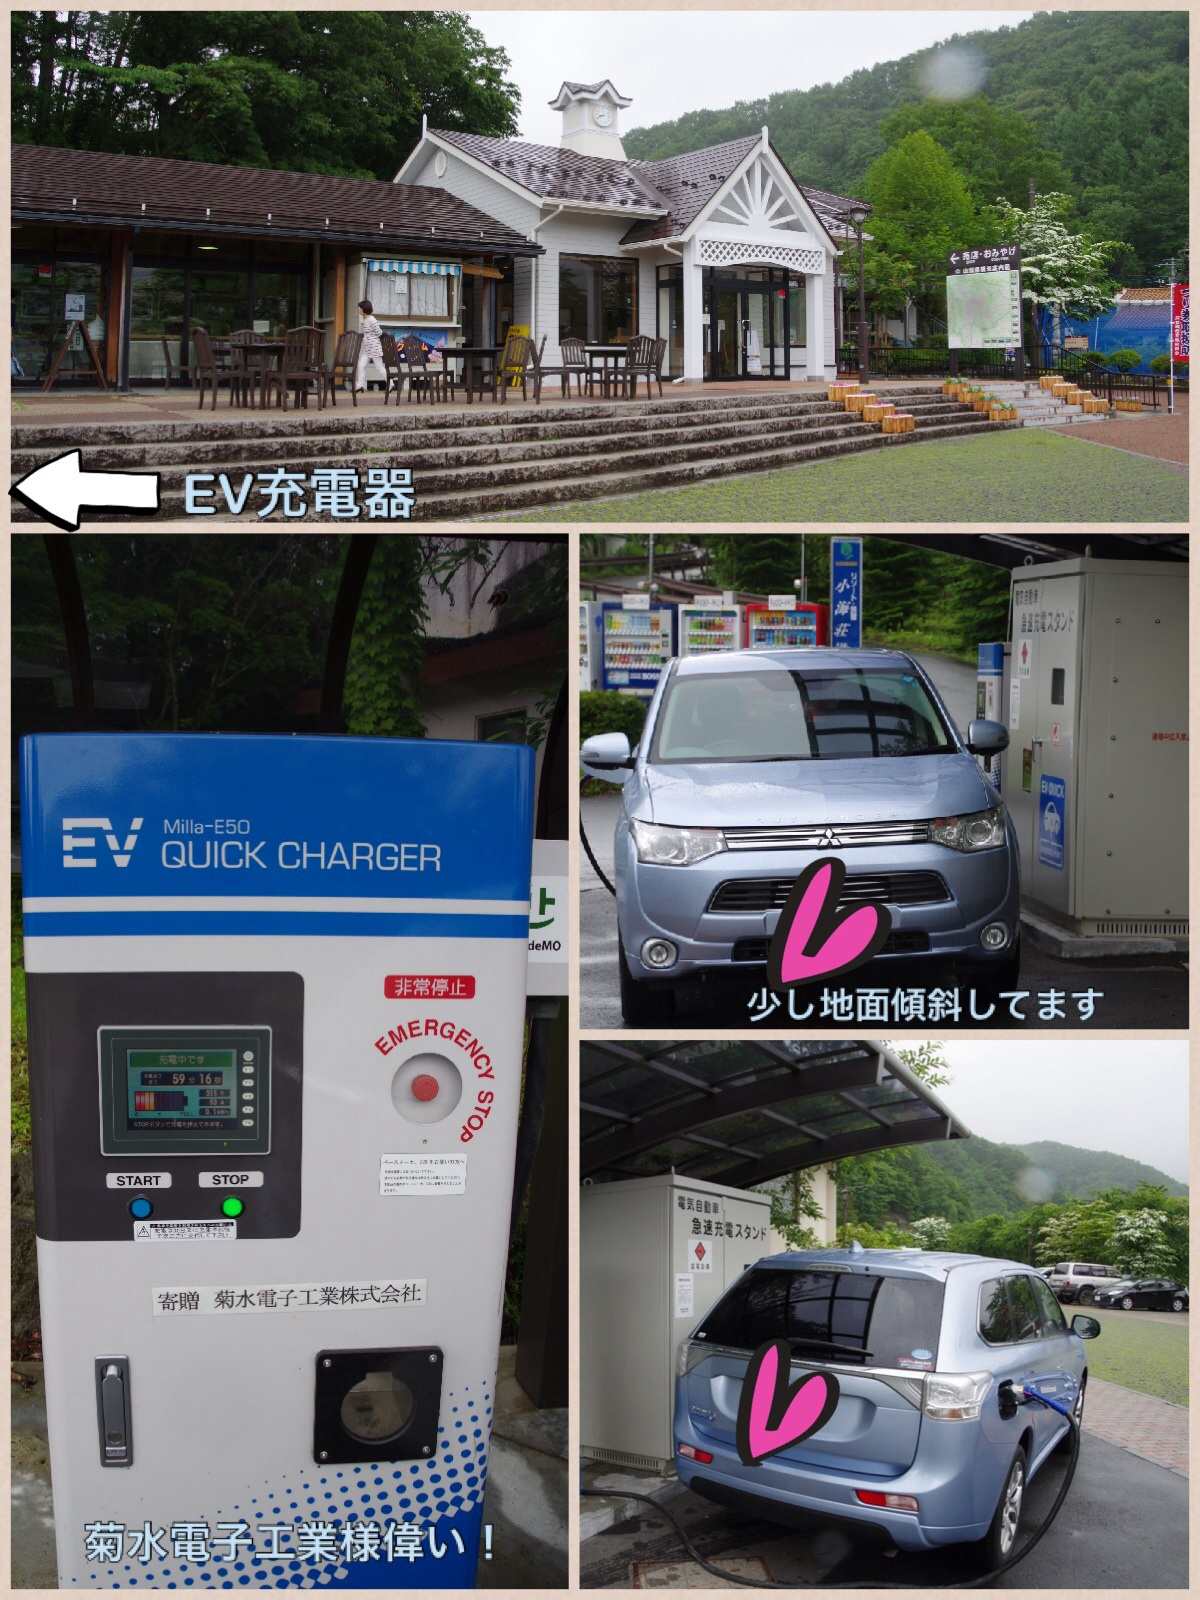 EV充電施設 道の駅かつやま